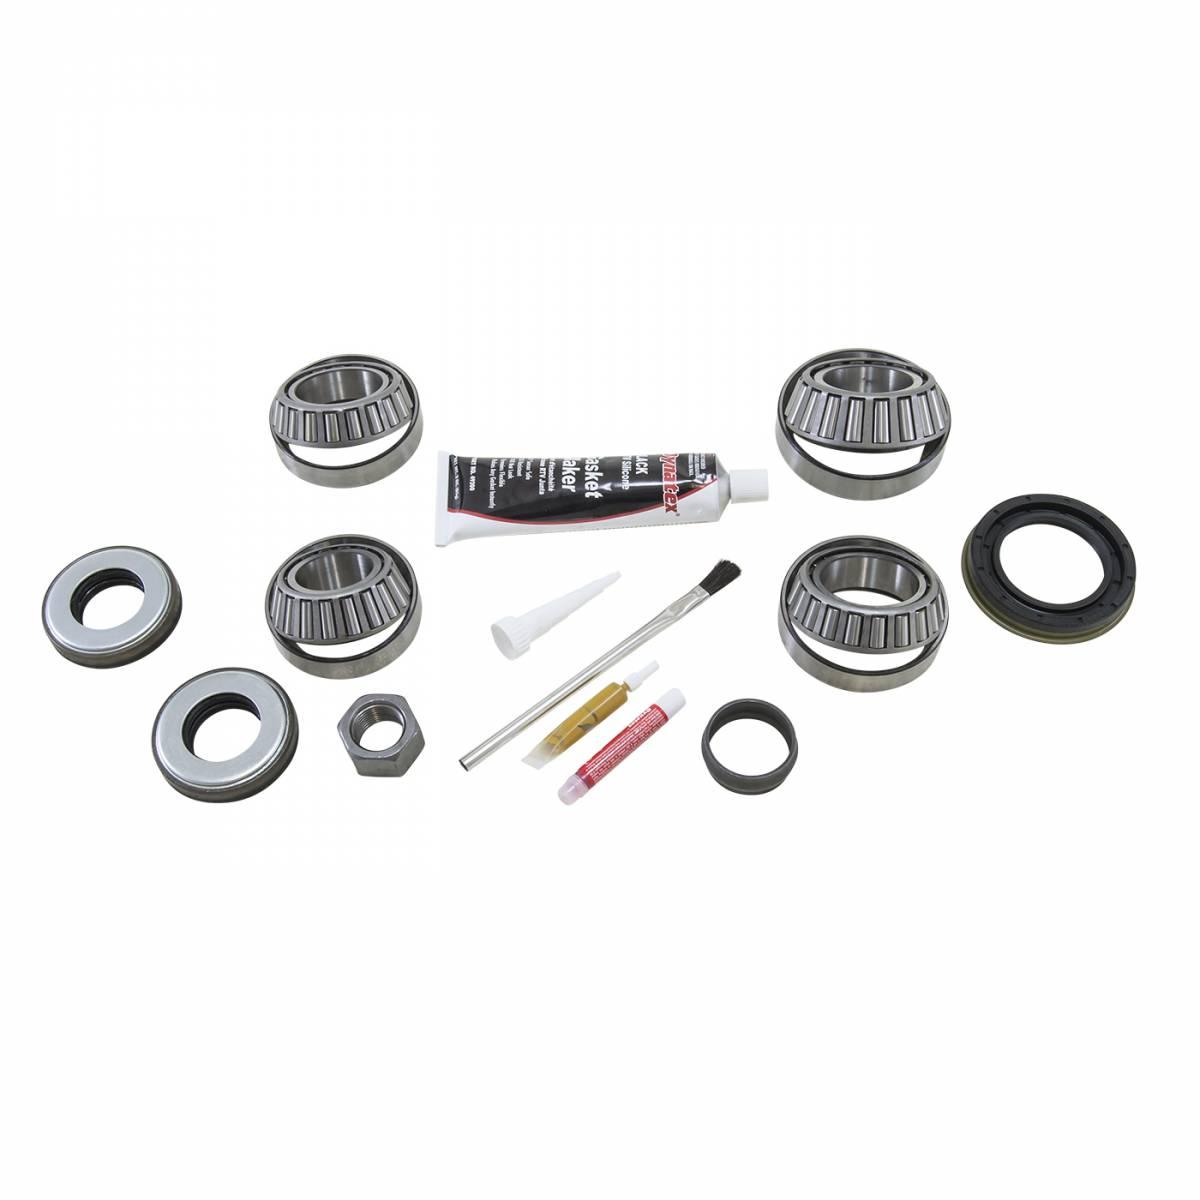 Yukon Gear Bk Gm8 25ifs B Differential Bearing Kit